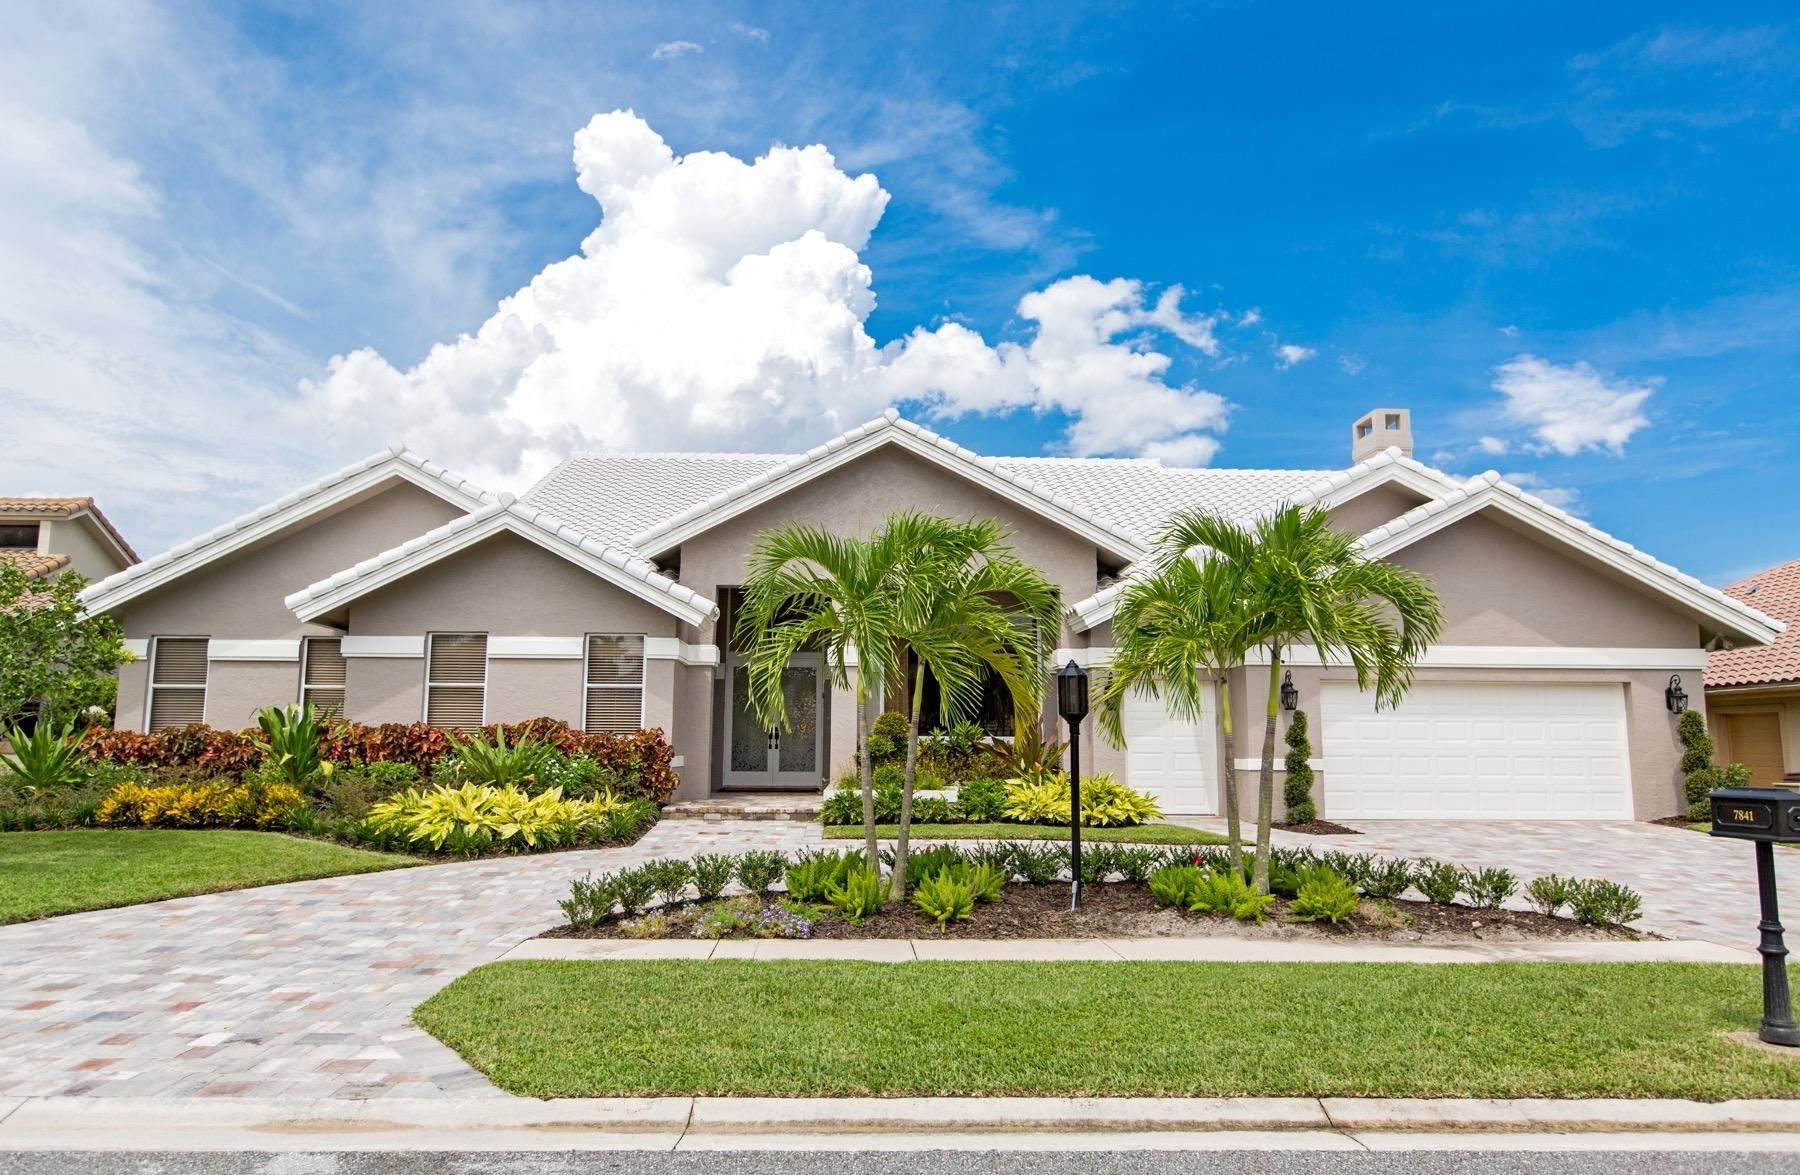 7841 Afton Villa Court, Boca Raton, FL 33433 - #: RX-10652180